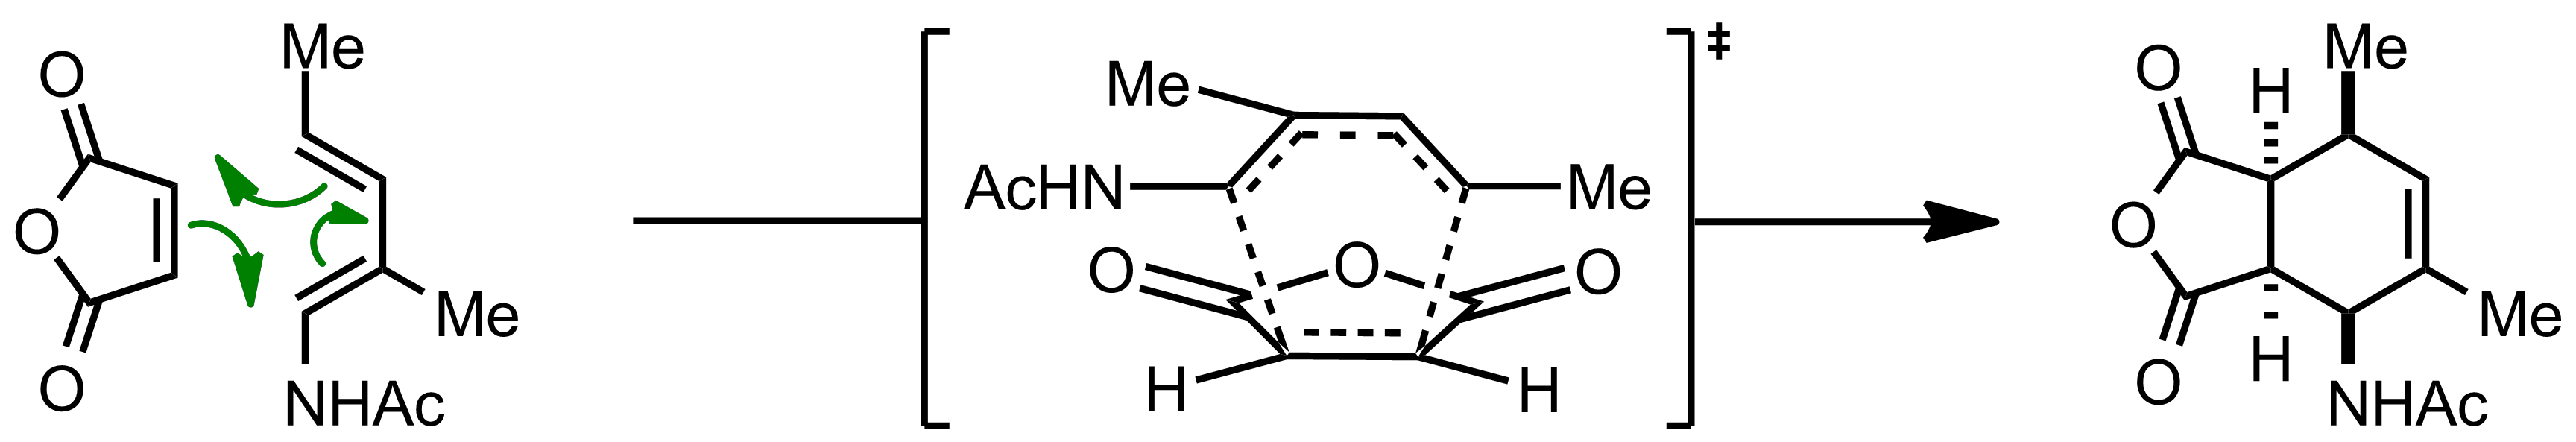 Mechanism of the Diels-Alder Reaction